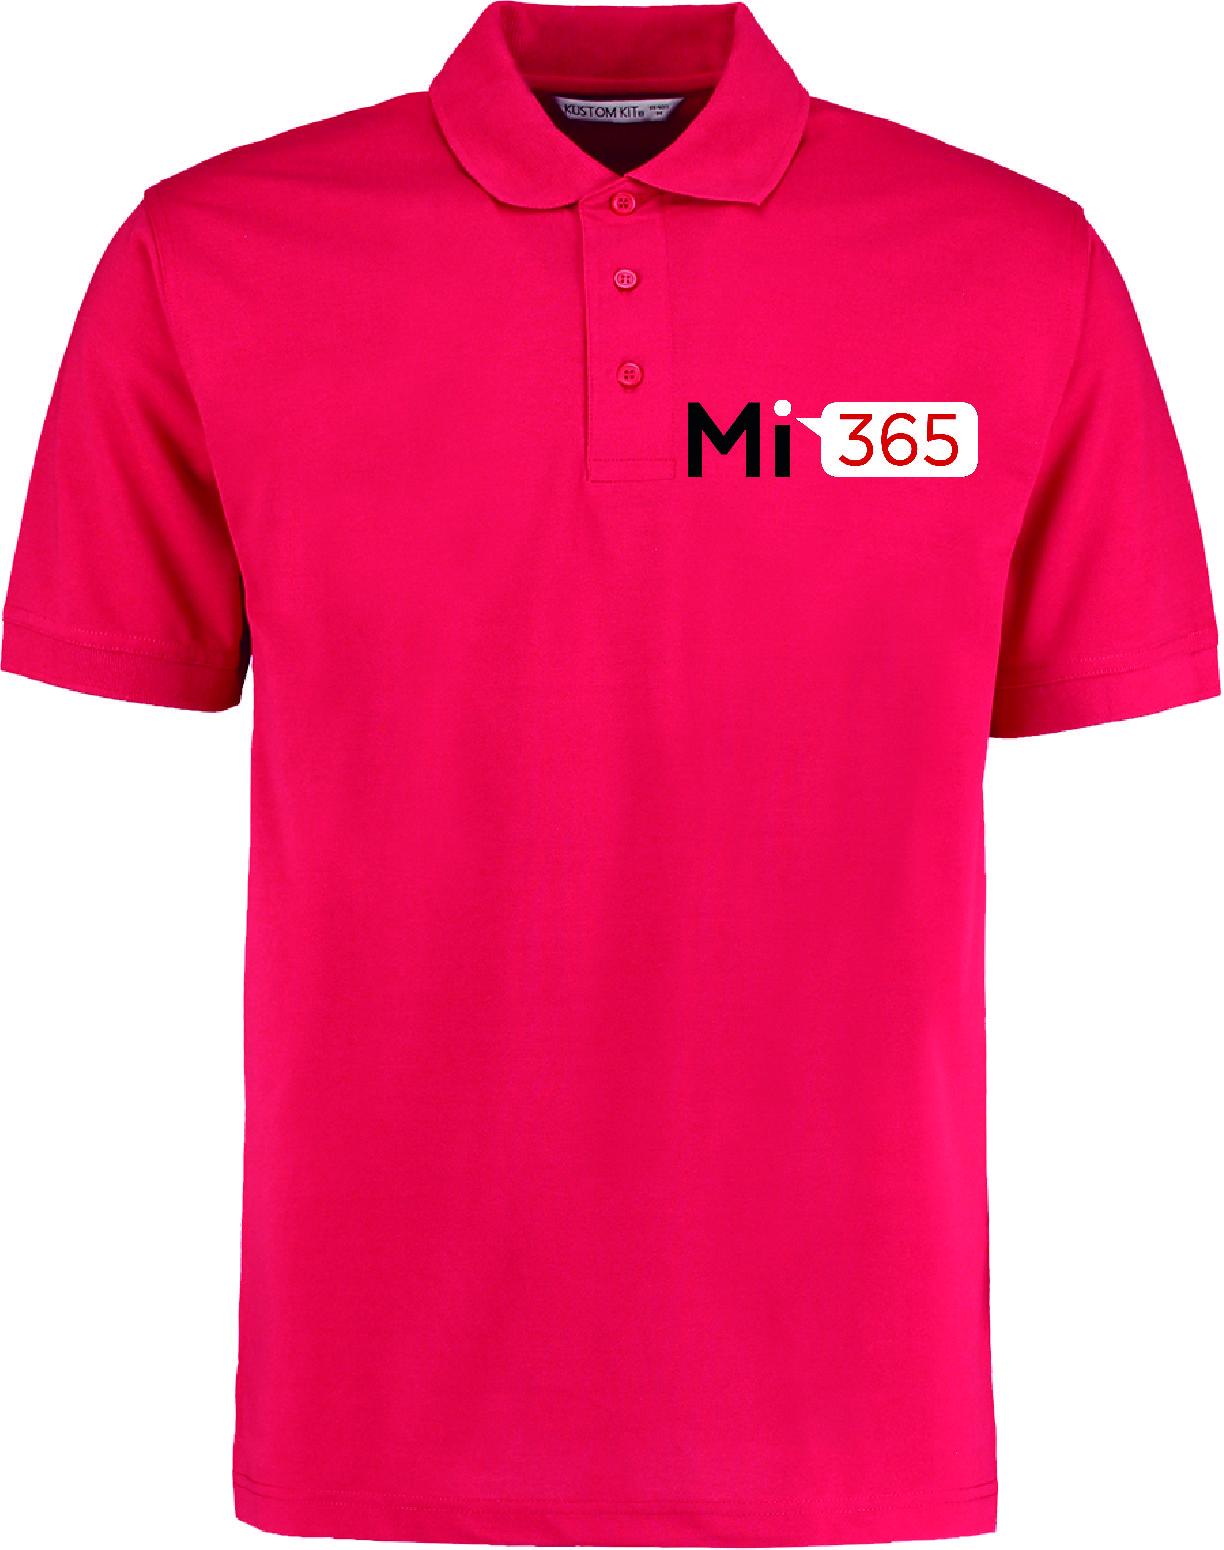 Mi365 - Polo Shirt